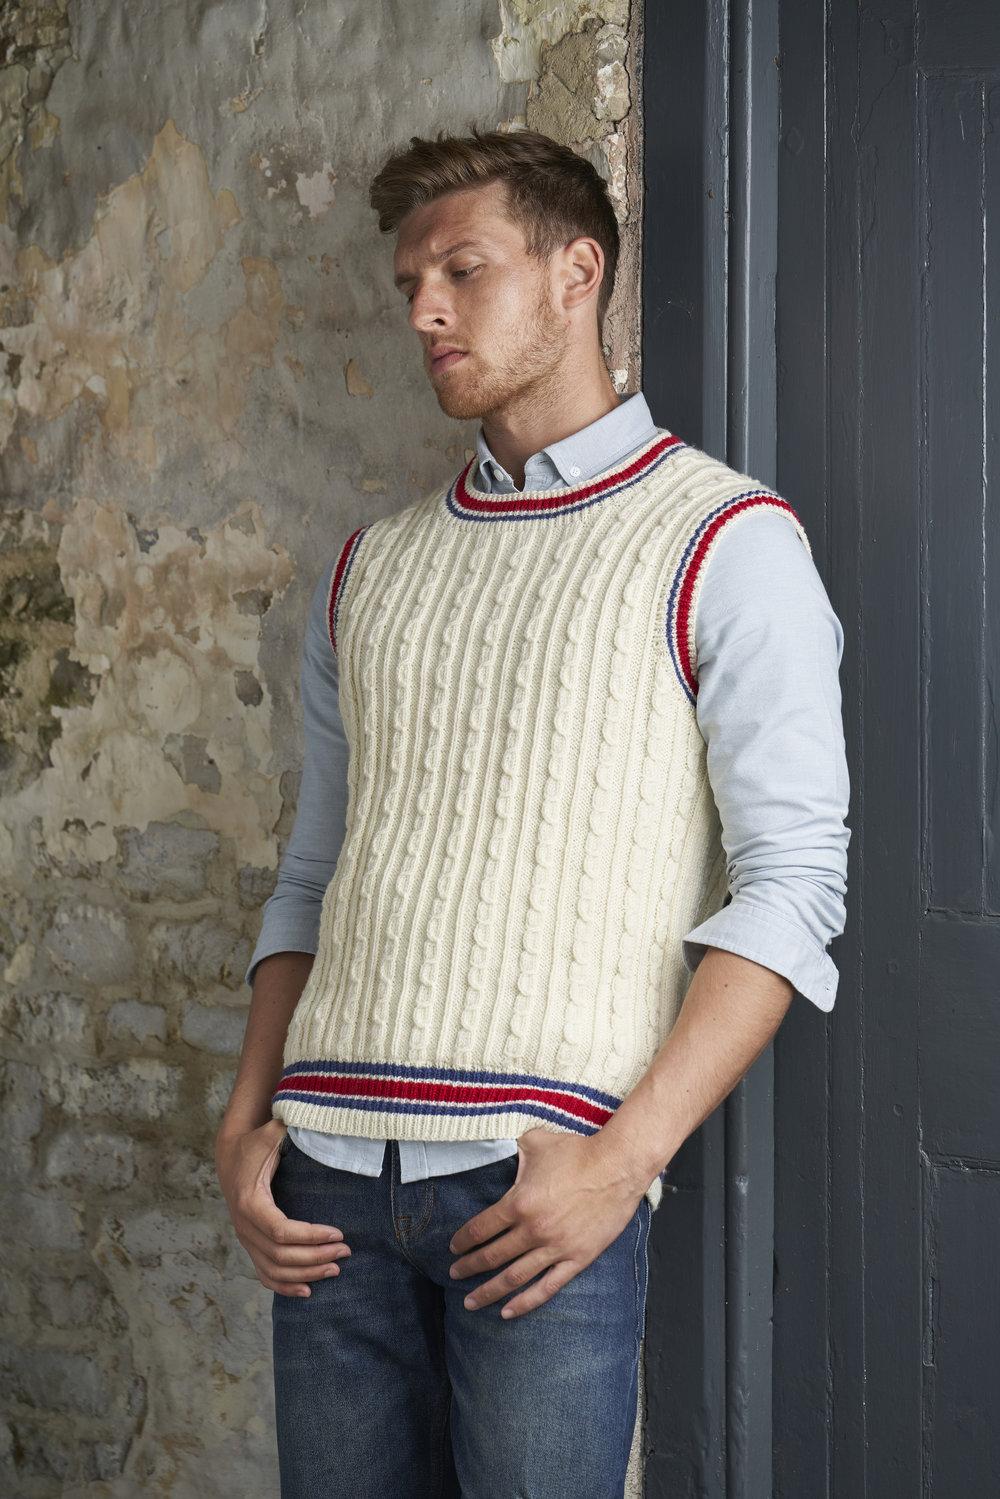 knitter070618jw_2335.jpg